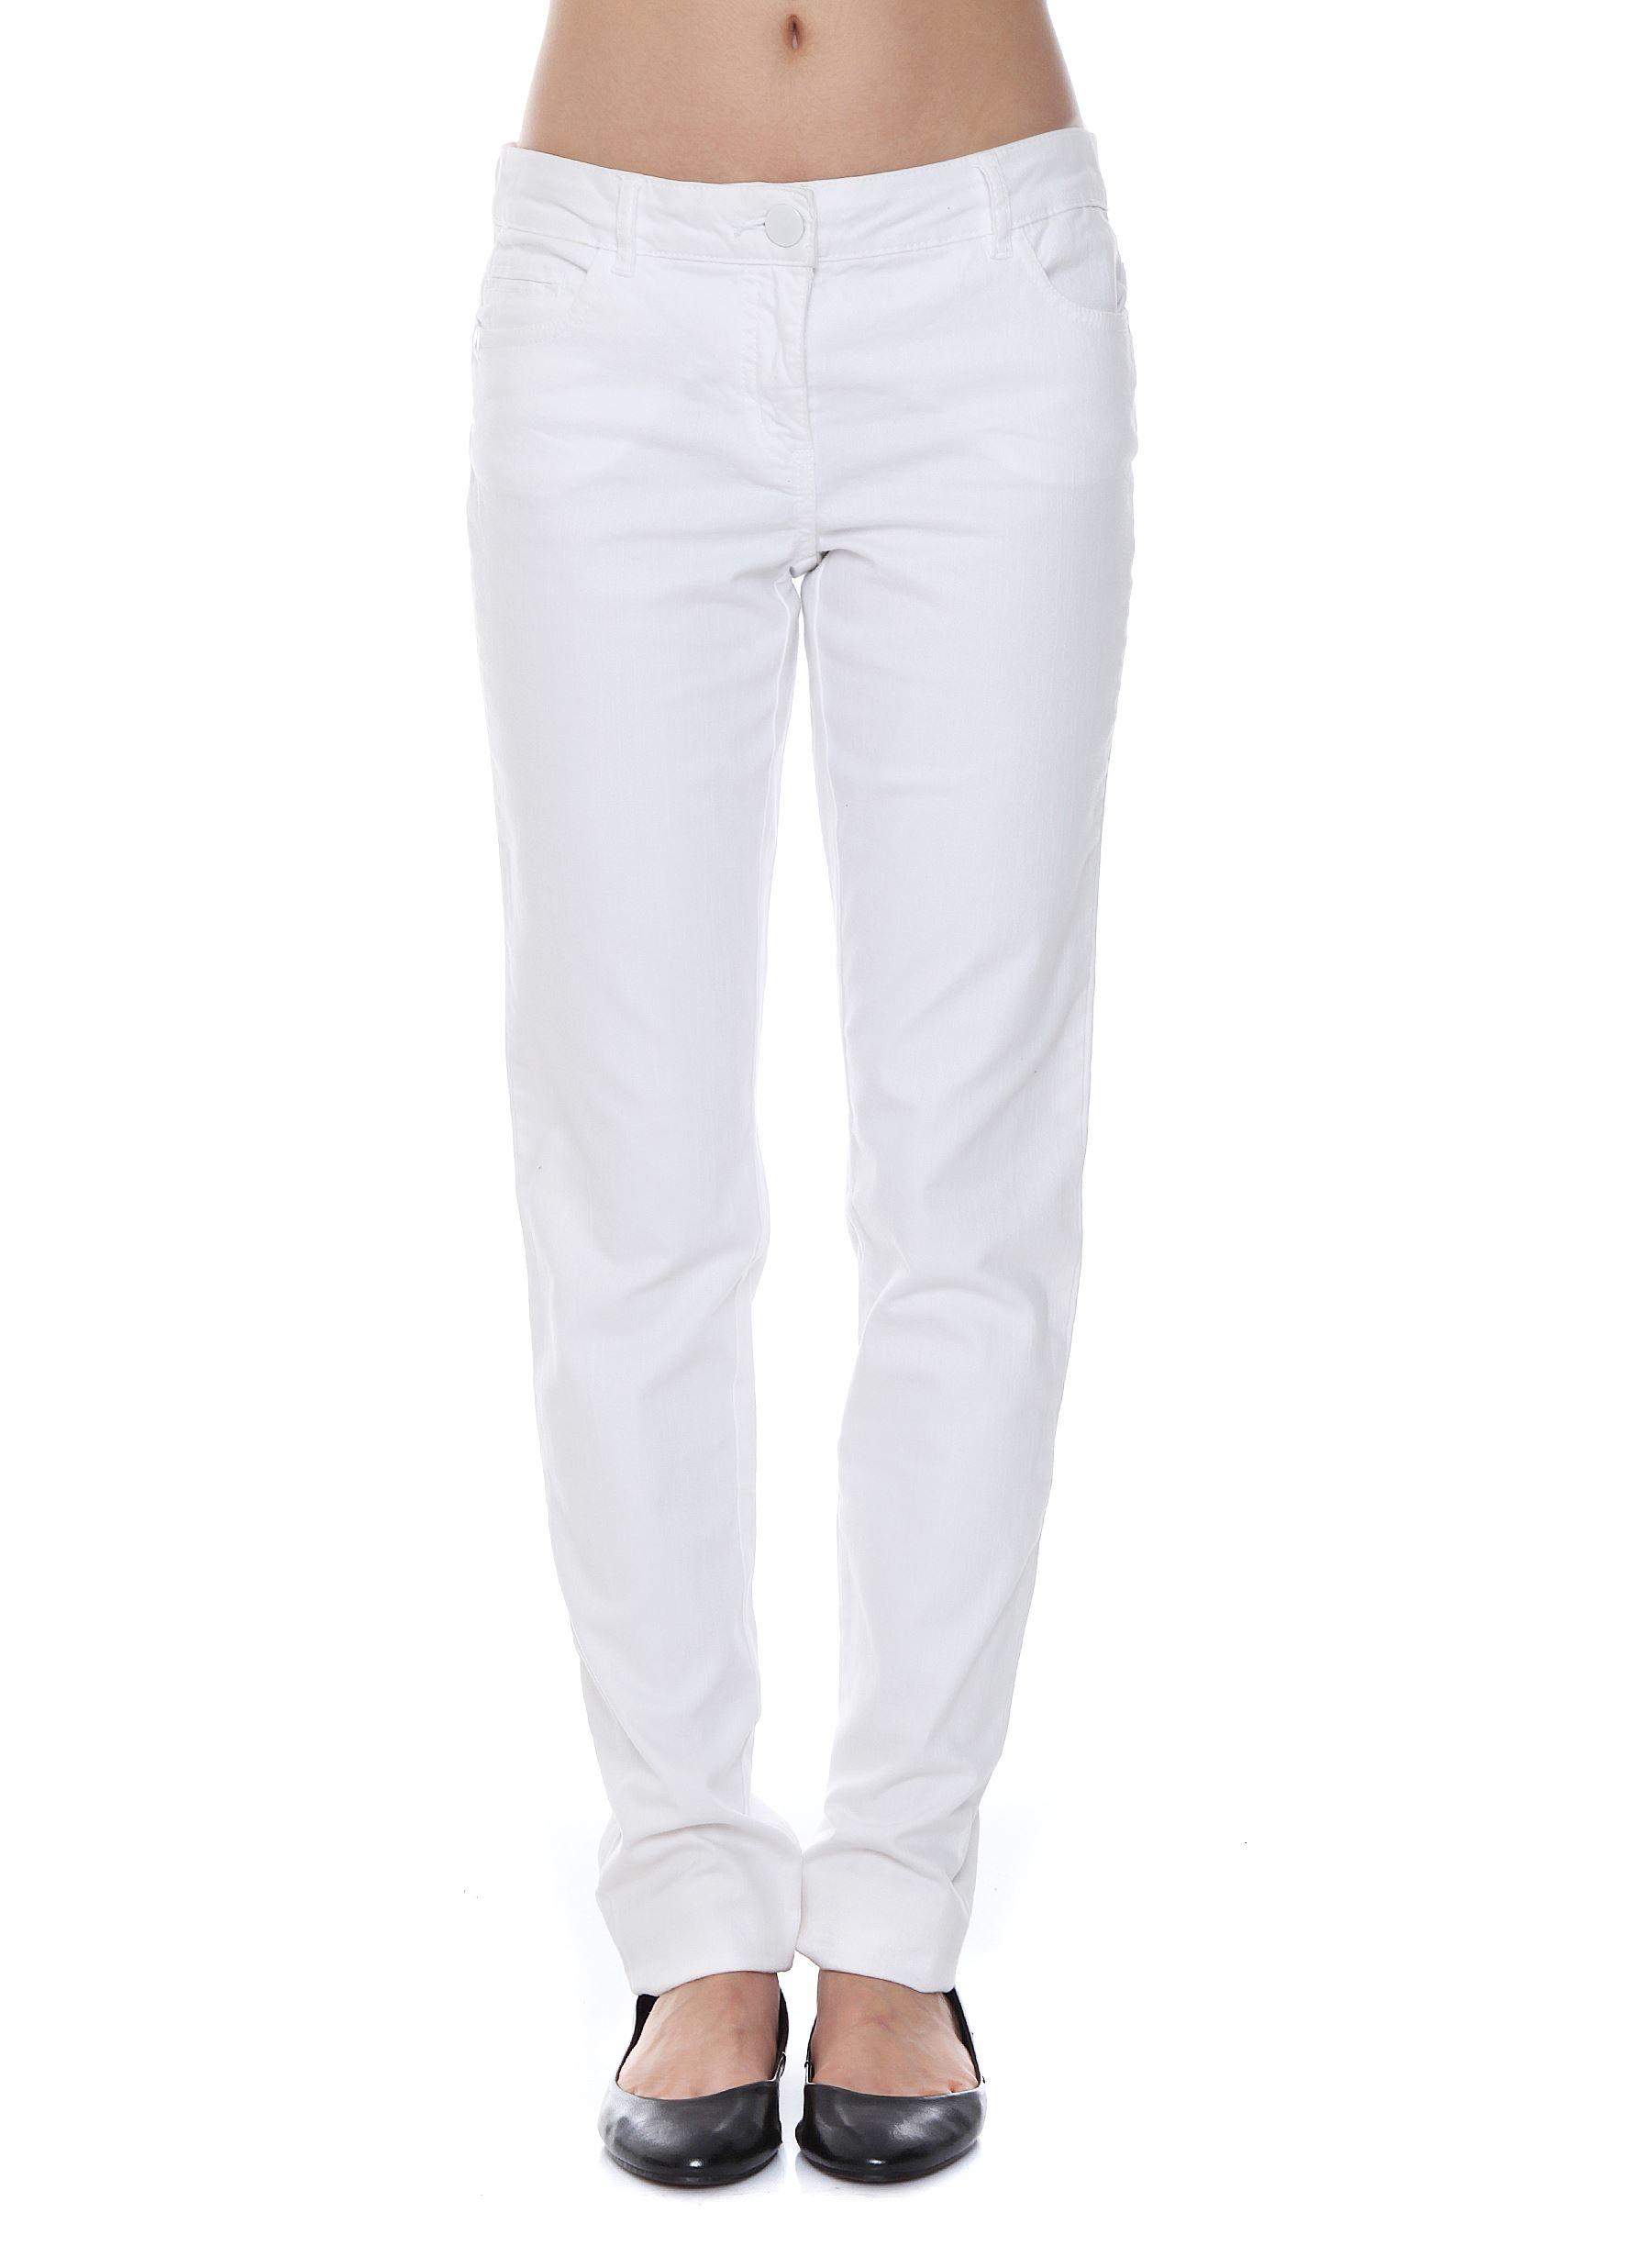 Easy Style - Γυναικείο Παντελόνι Naf Naf